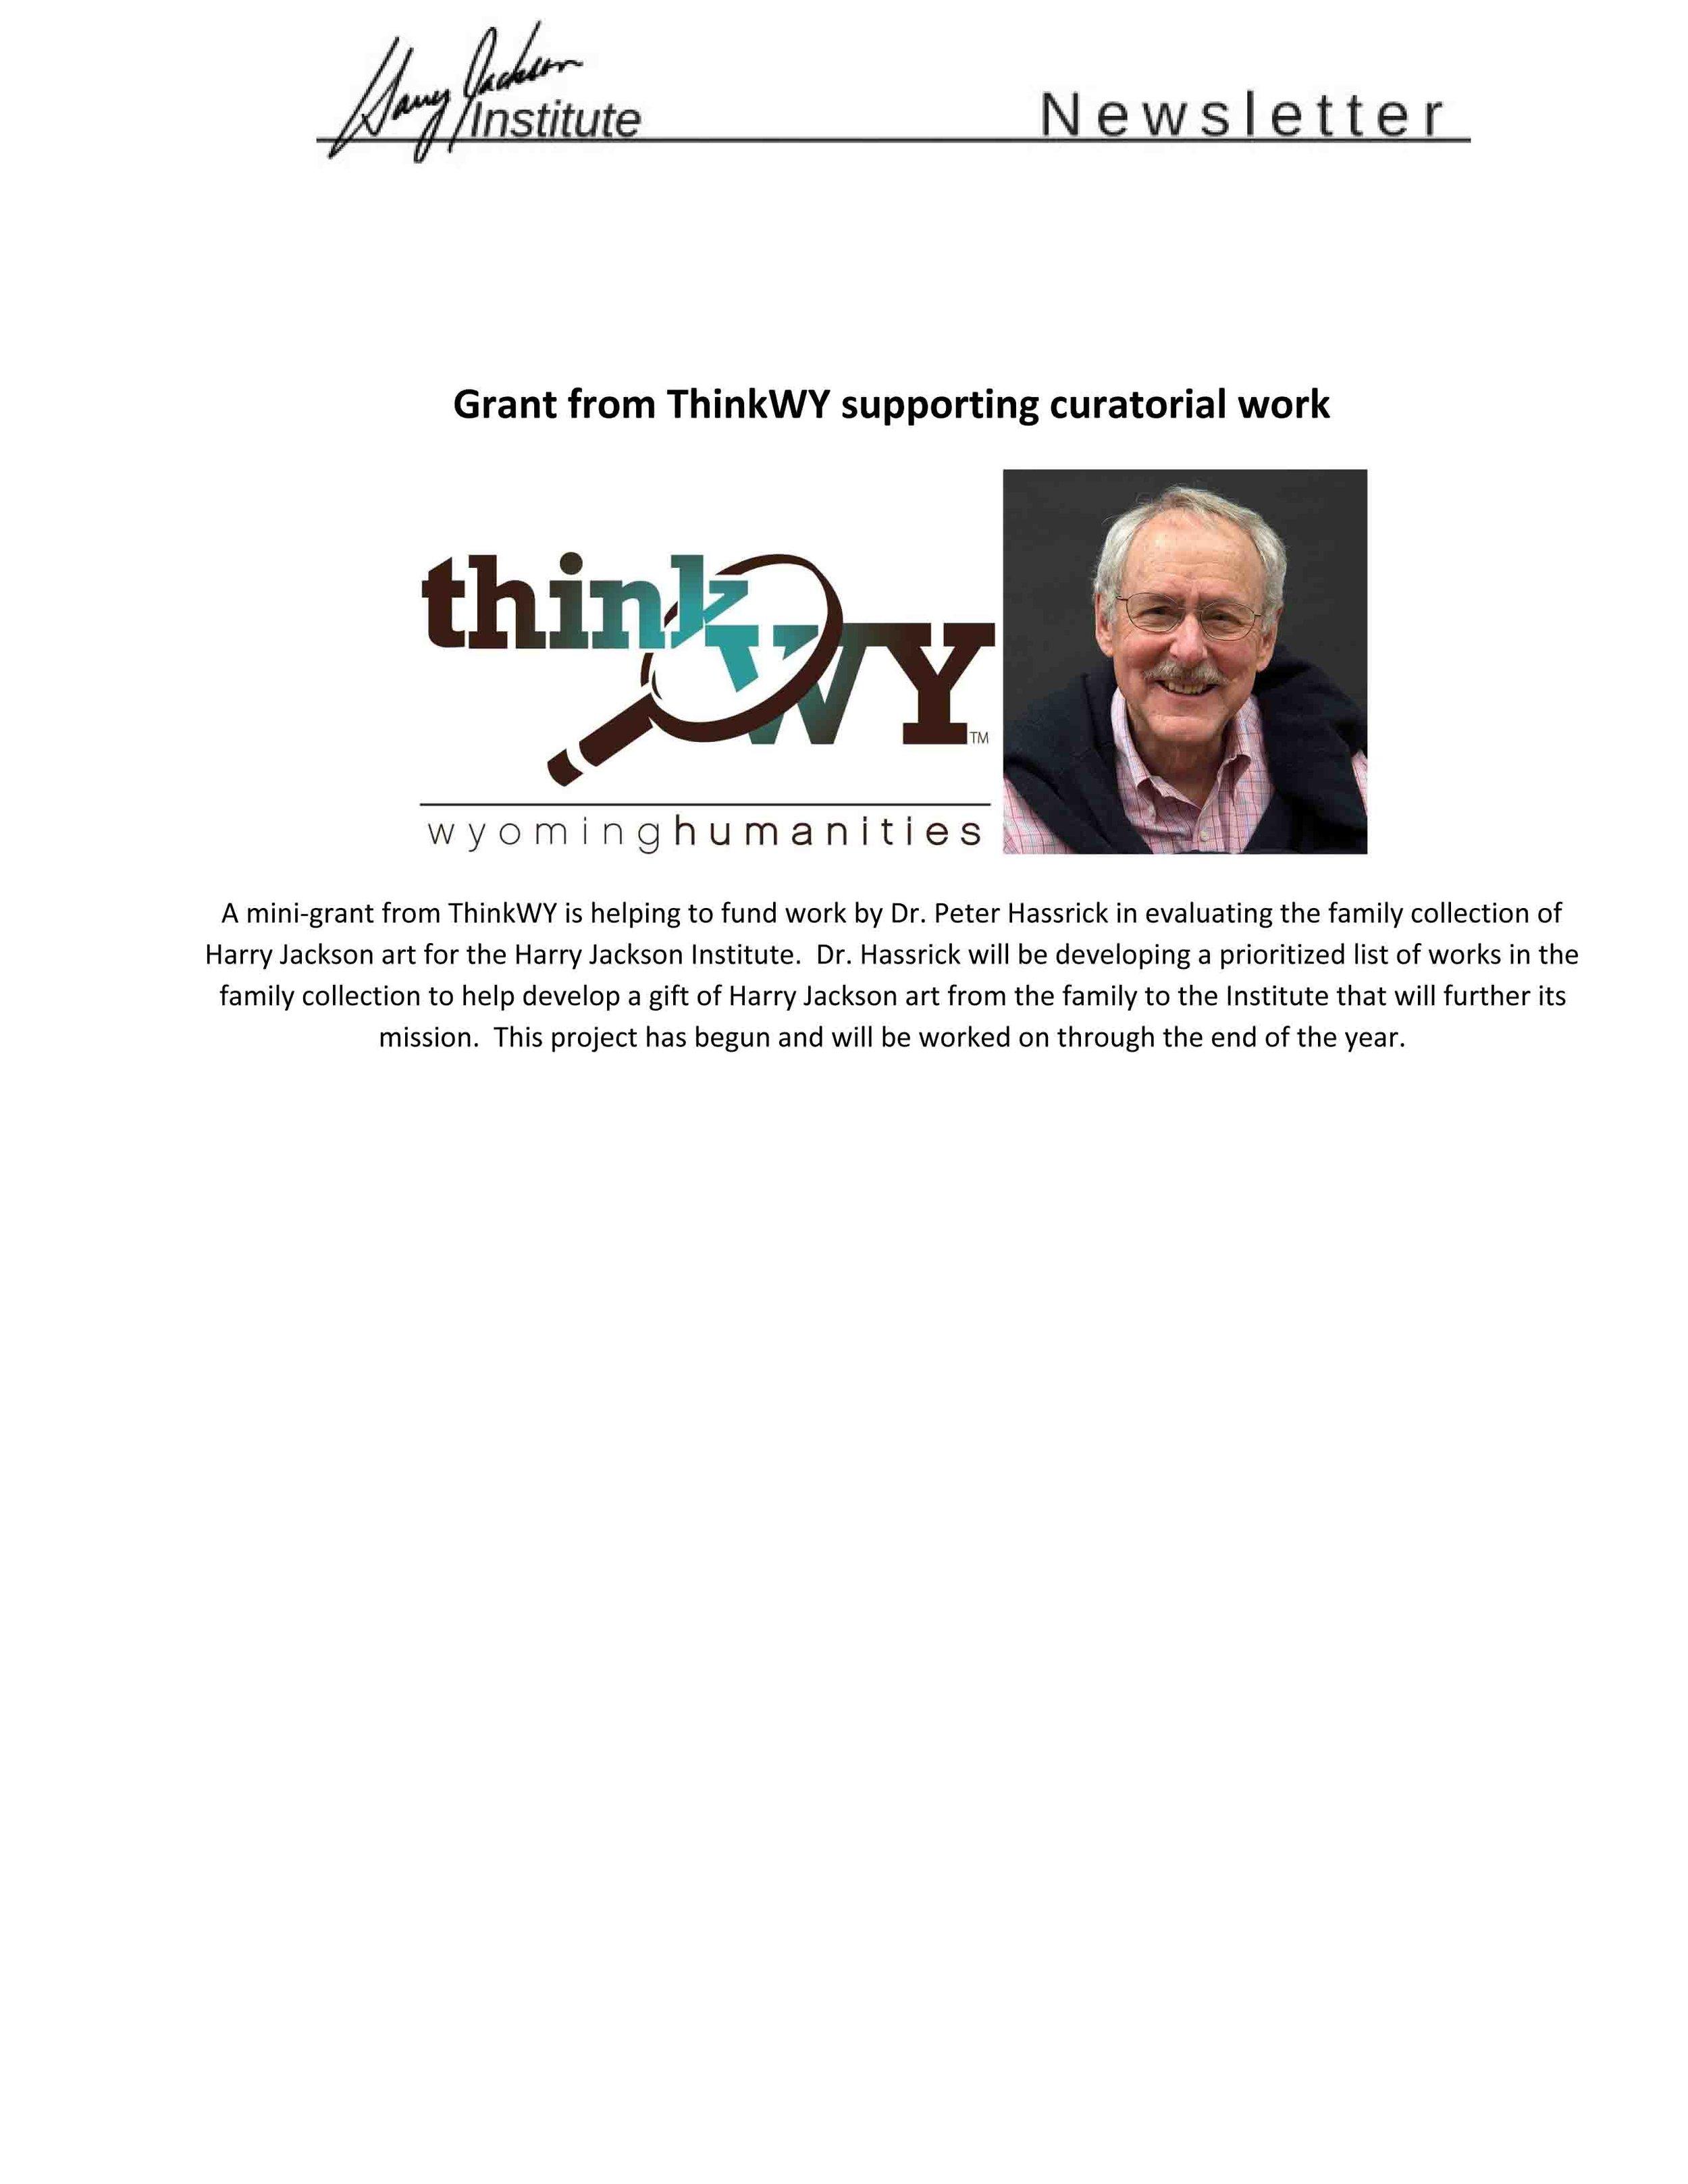 2017_10_01 Harry Jackson Iinstitute Newsletter-2.jpg